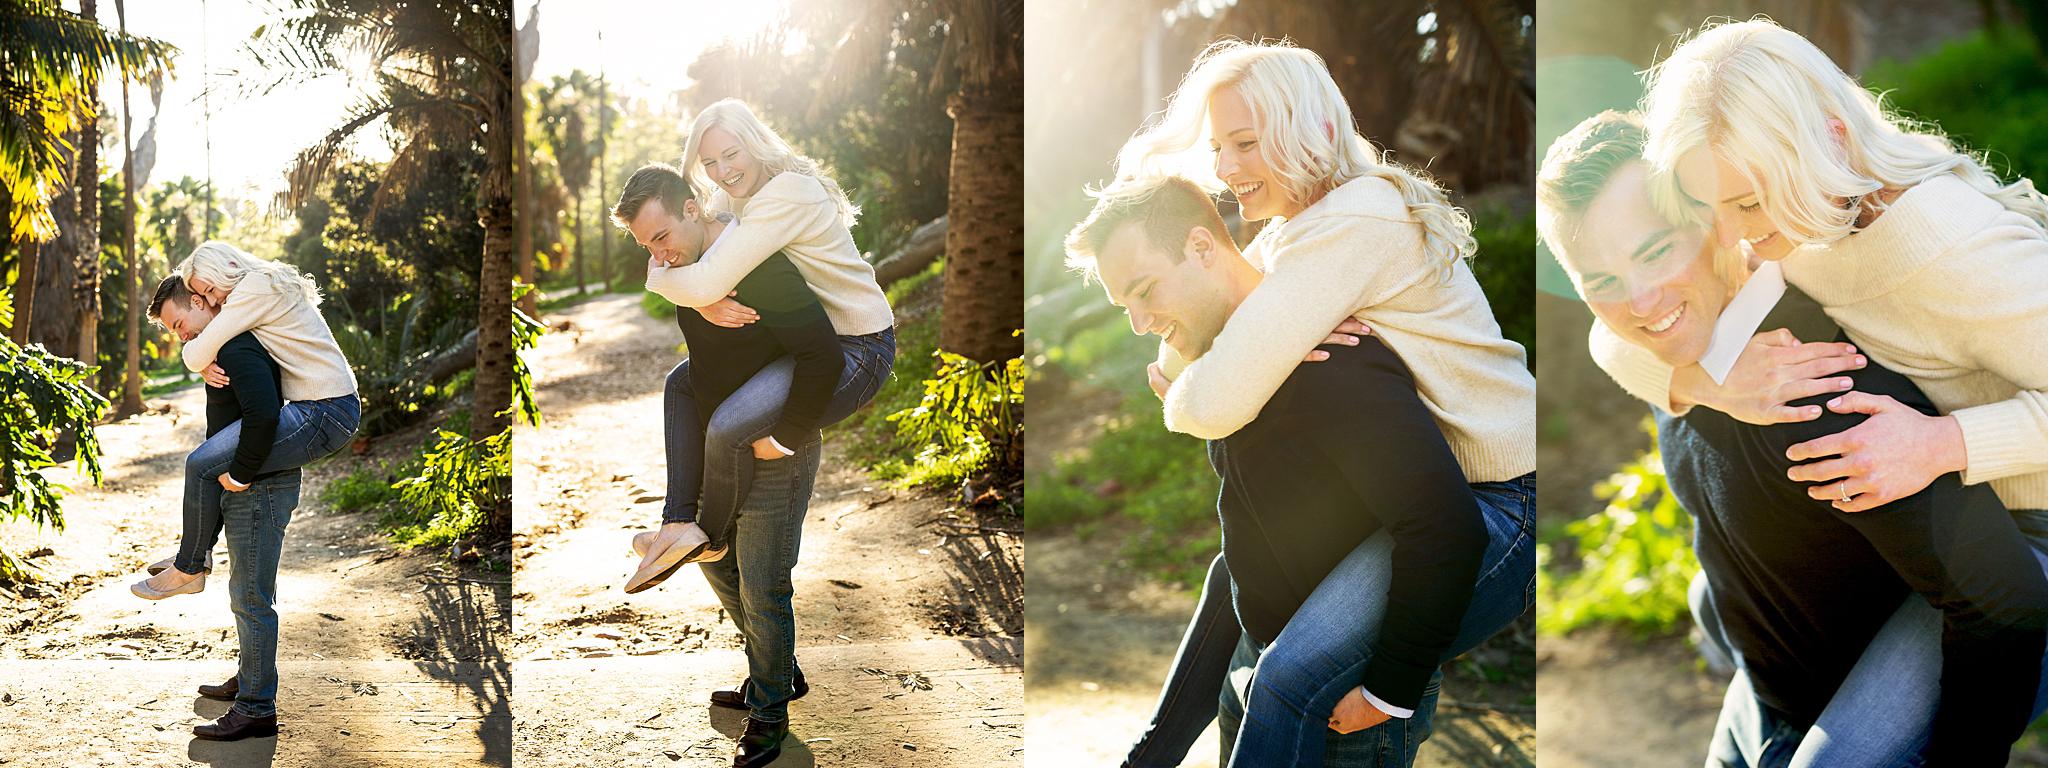 Cora enjoys a piggyback ride from Zach in Balboa Park's Palm Court.